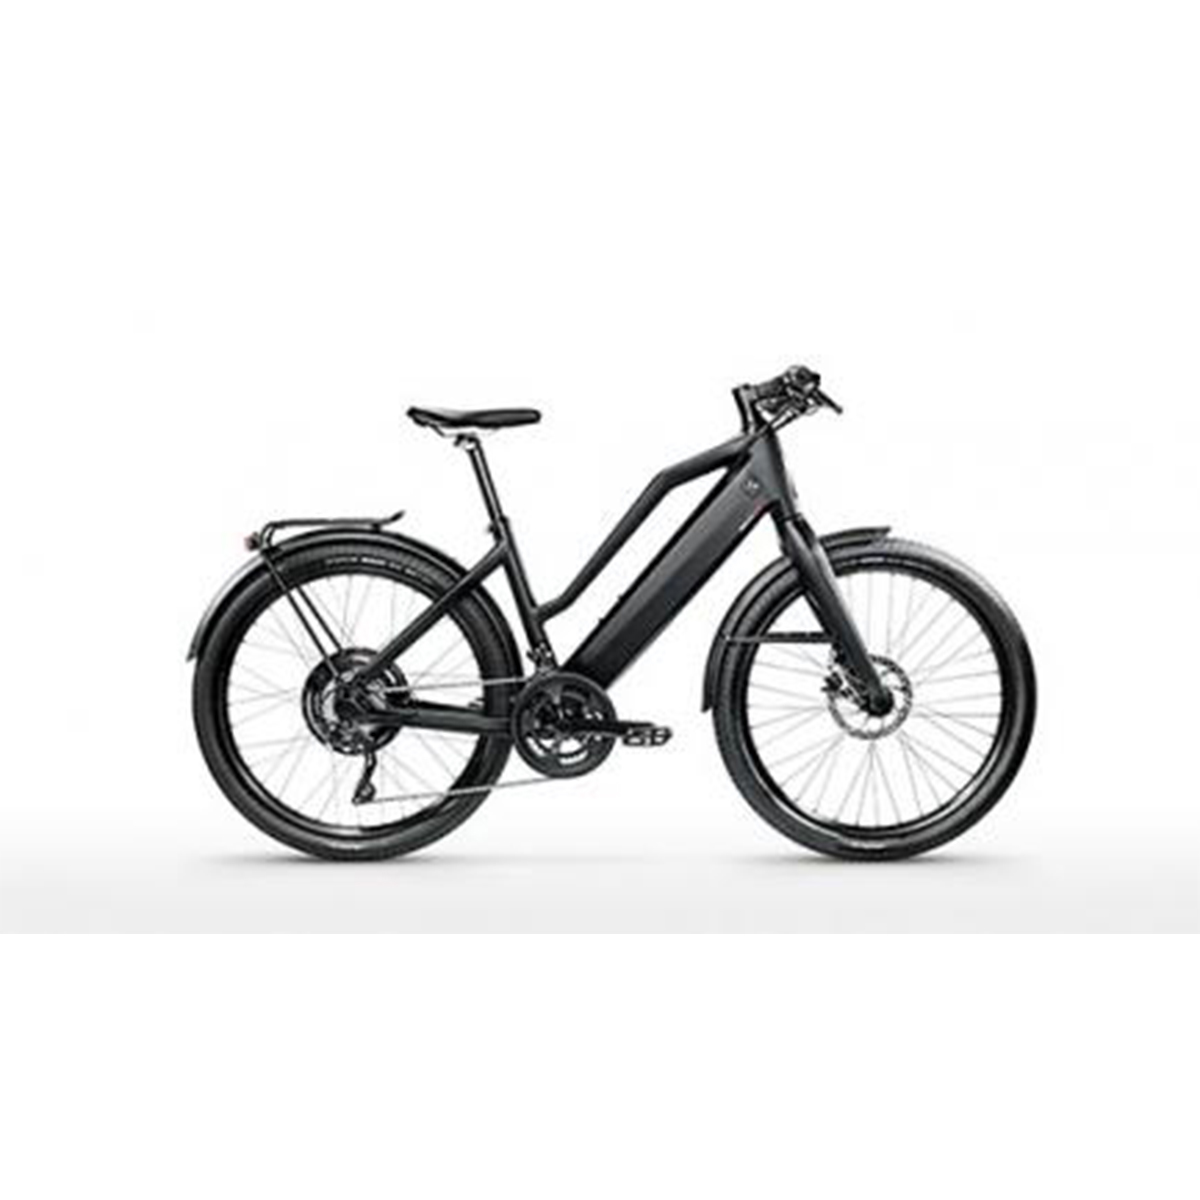 Stromer ST2 Bike Comfort